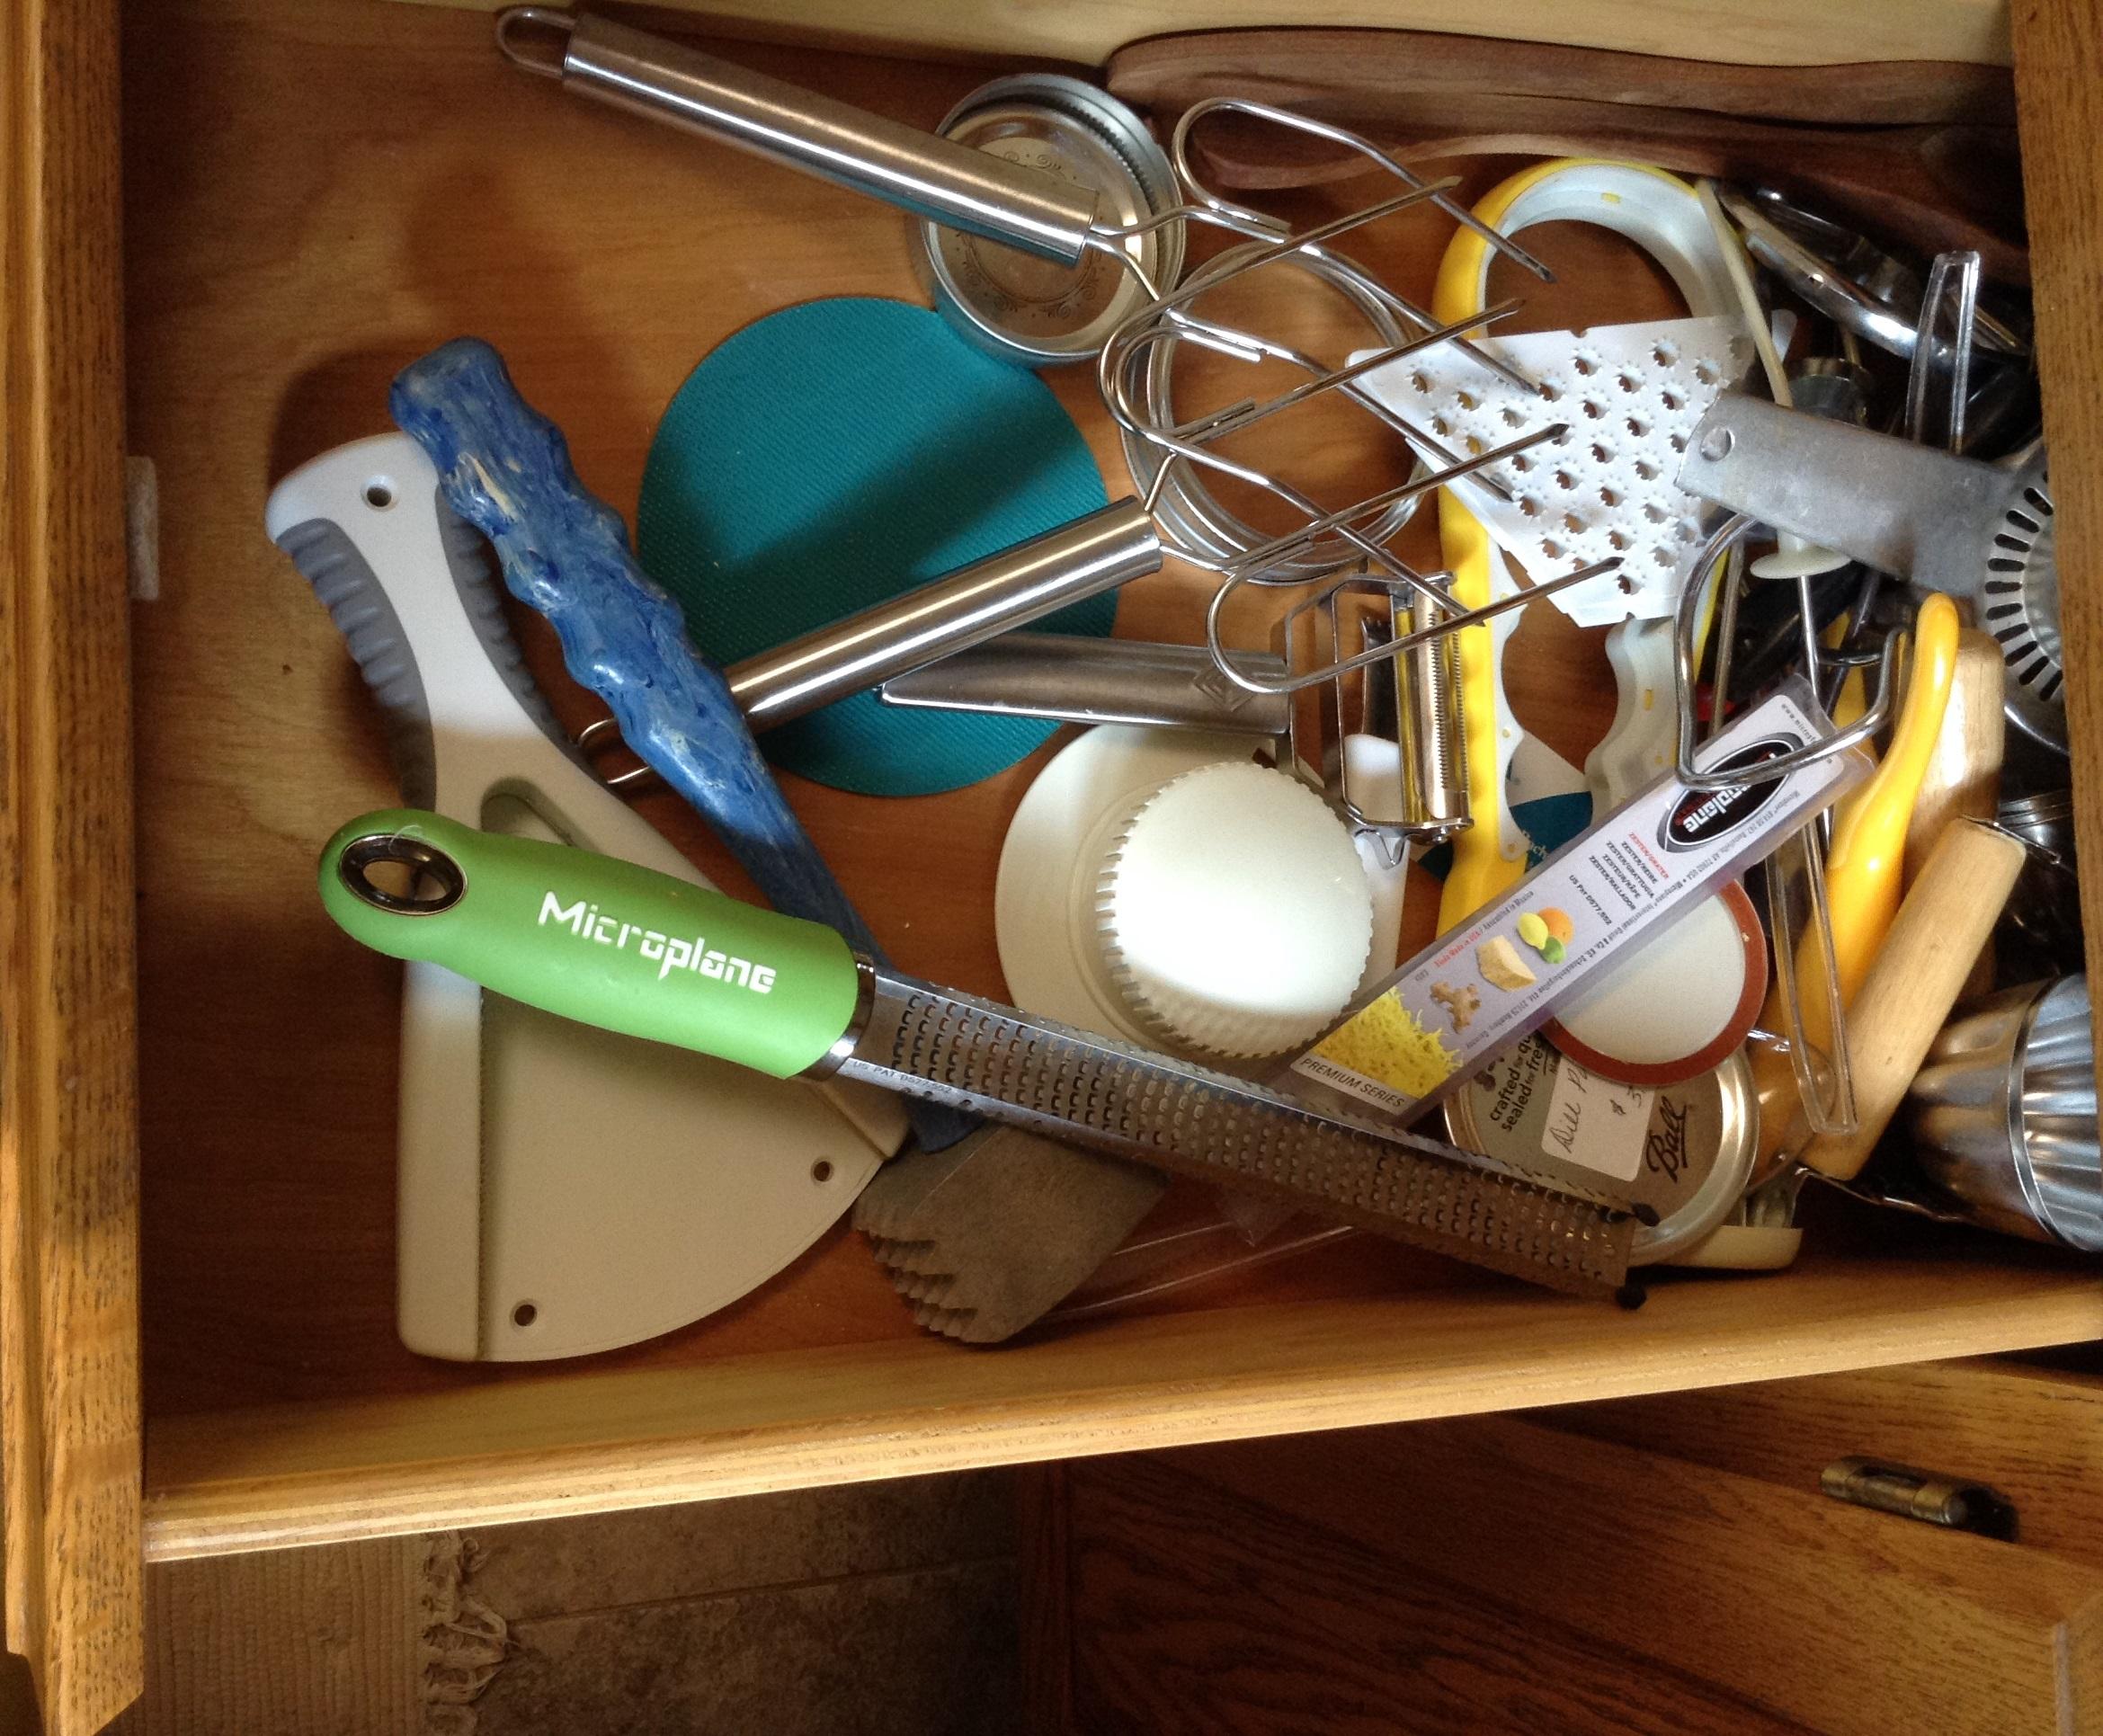 TIP #4 - Eliminate unused kitchen clutter.